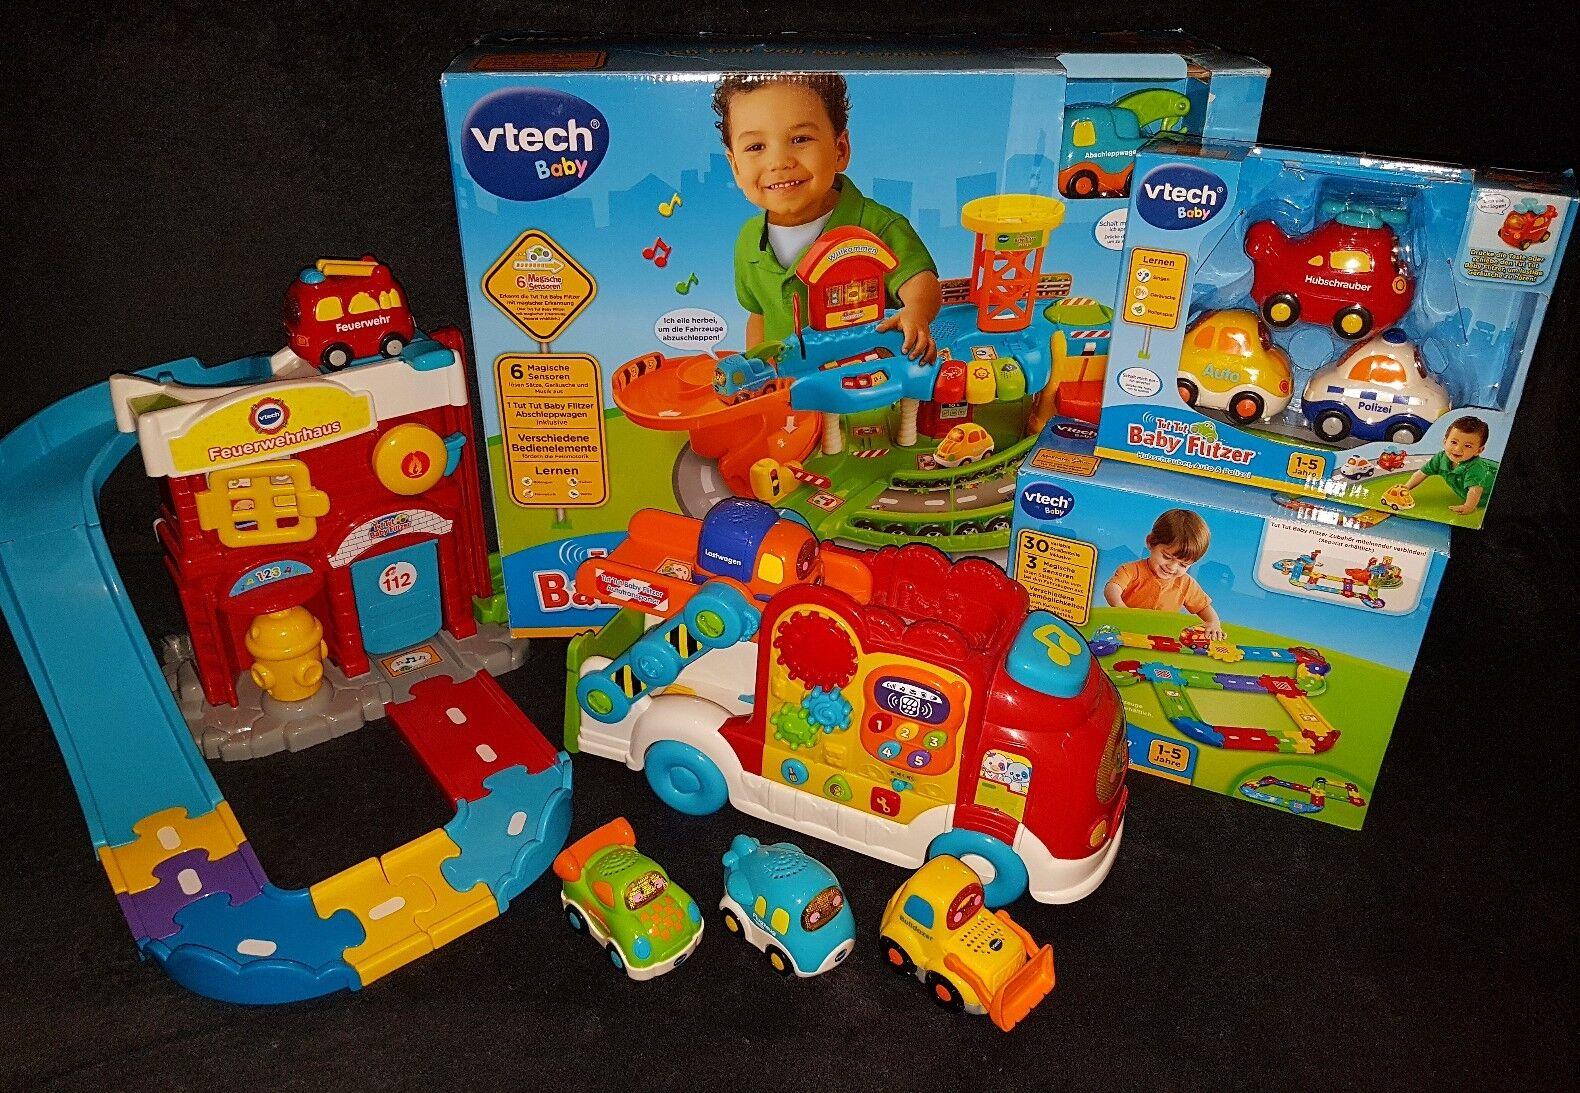 VTech Tut Tut Baby Flitzer Set